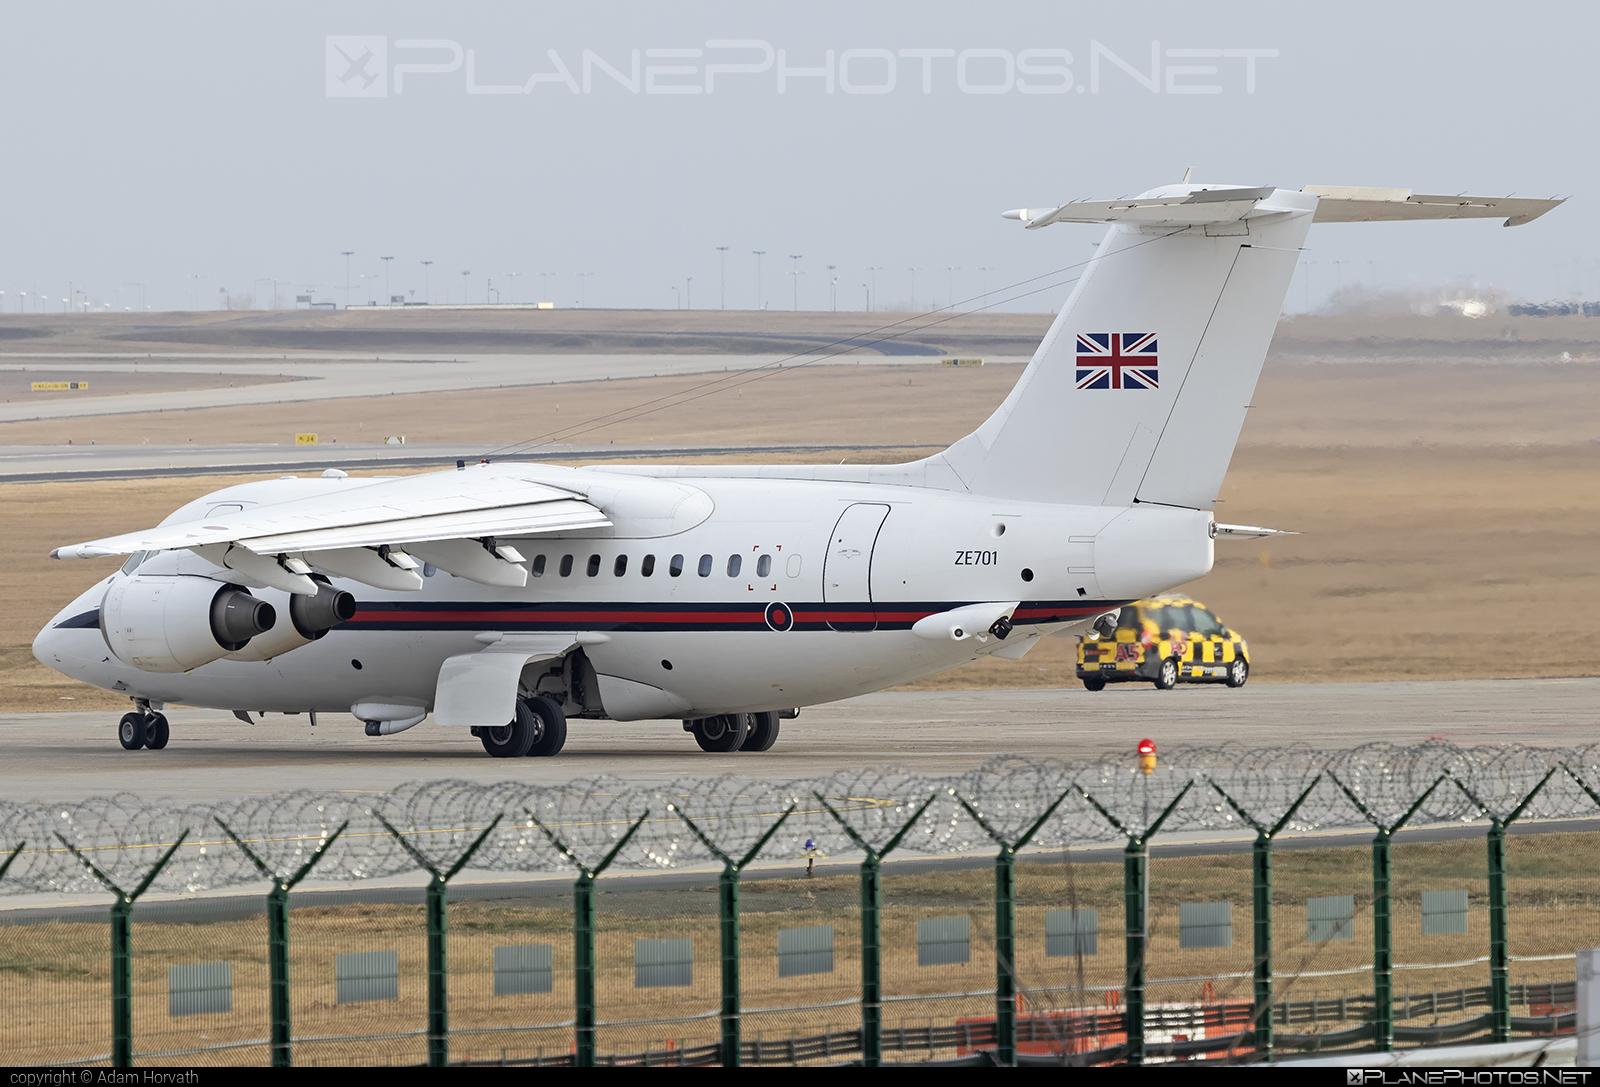 British Aerospace BAe 146 CC.2 - ZE701 operated by Royal Air Force (RAF) #bae146 #bae146cc2 #britishaerospace #raf #royalairforce